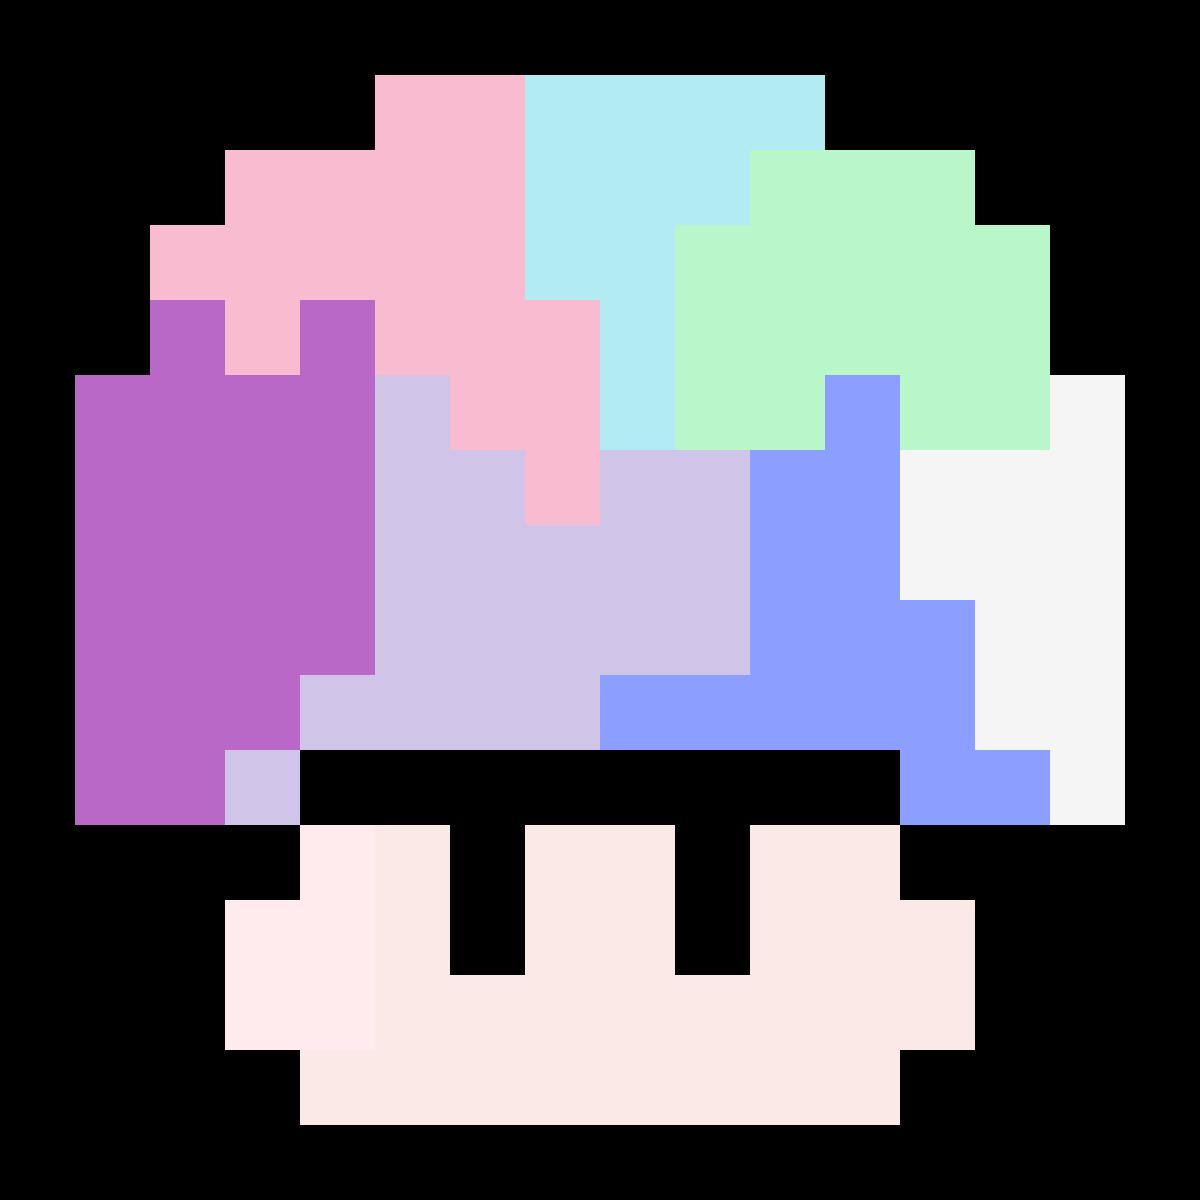 Pixilart Pastel Mario Mushroom By Kingcookie1111